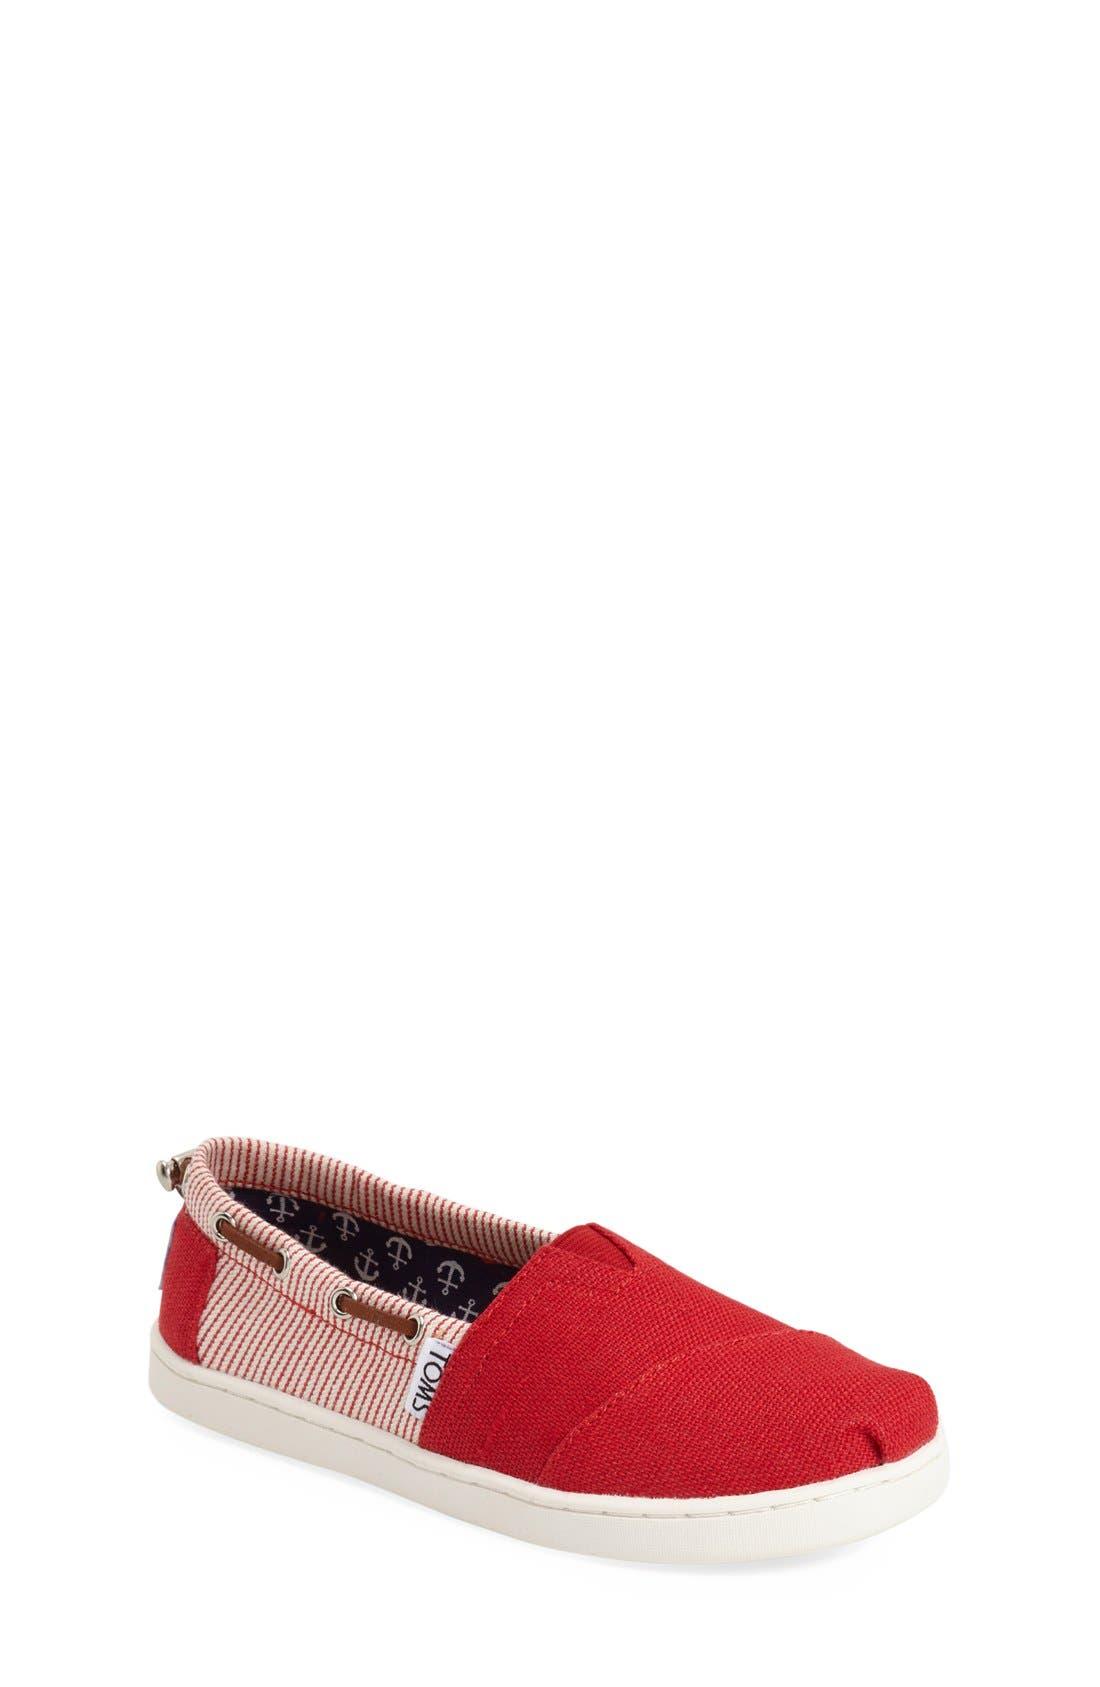 'Bimini' Print Slip-On,                         Main,                         color, MEDIUM RED